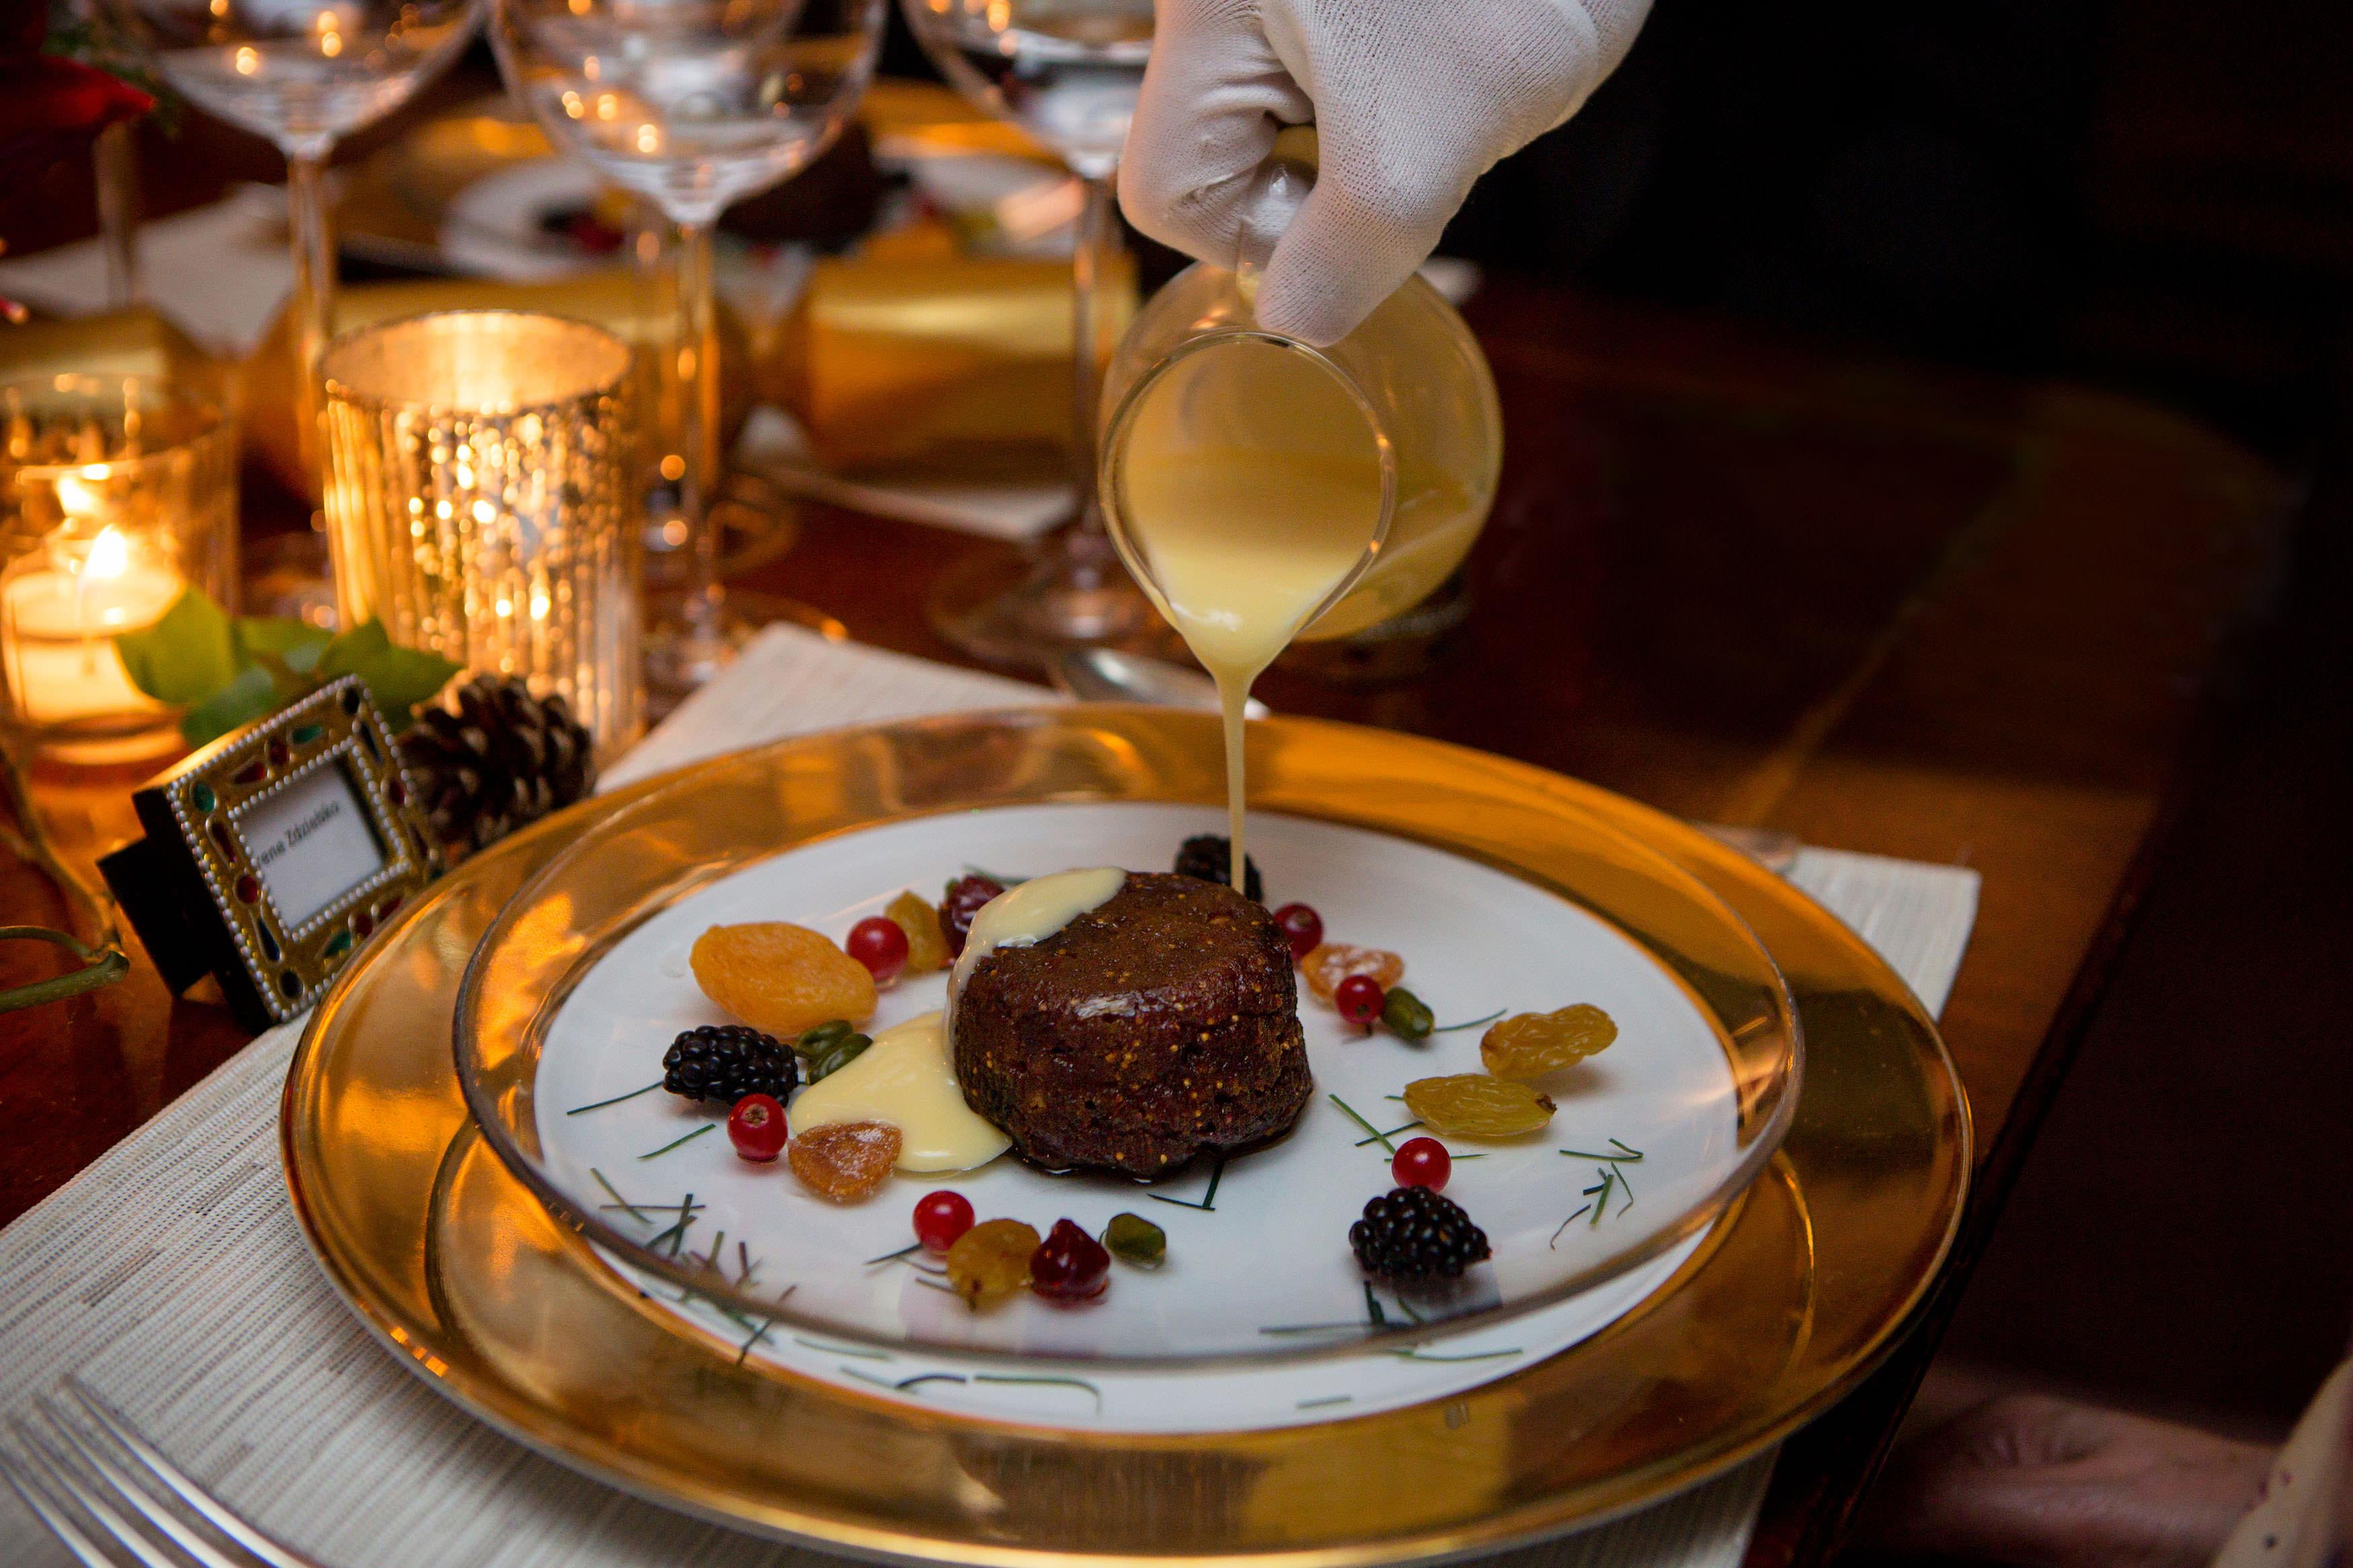 Ambassadors' Dinner - Regency Christmas Feast - Plum & Fig Christmas Pudding